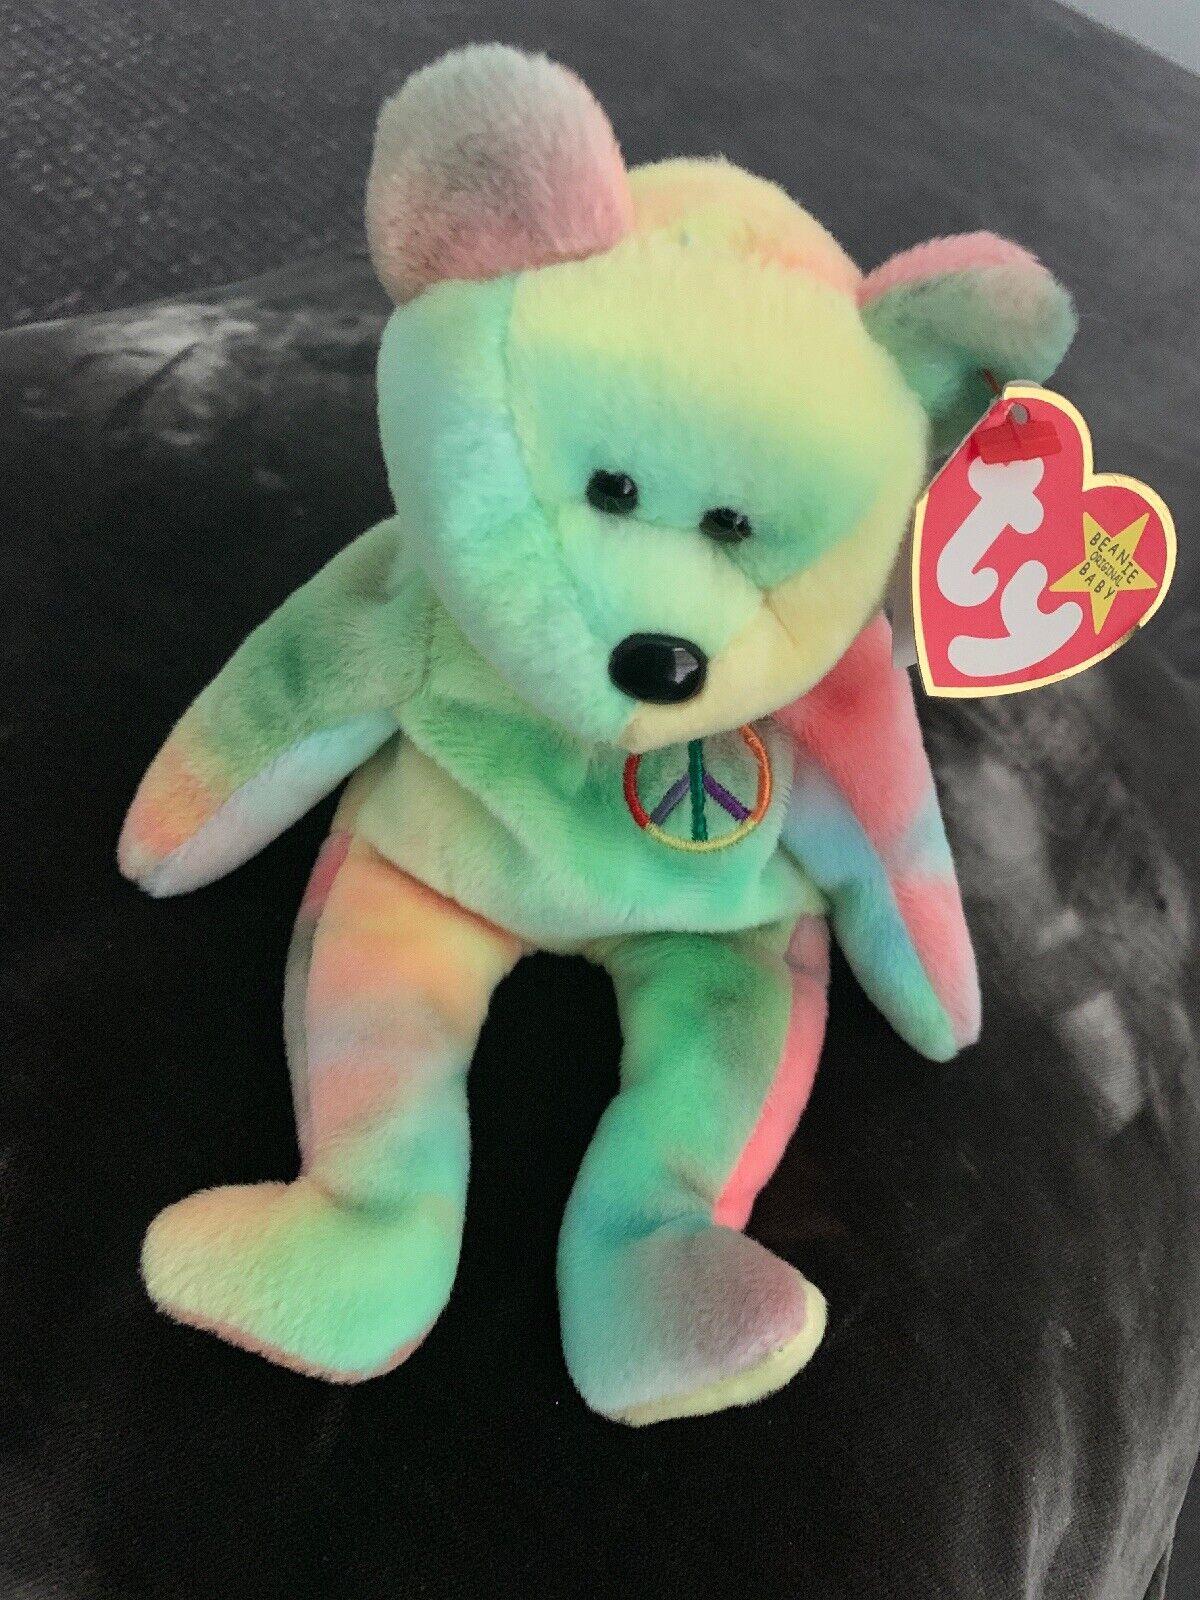 1996 Ty PEACE BEAR Beanie Baby AUTHENTIC RARITIES, ERRORS, (KR) WATERMARK 112